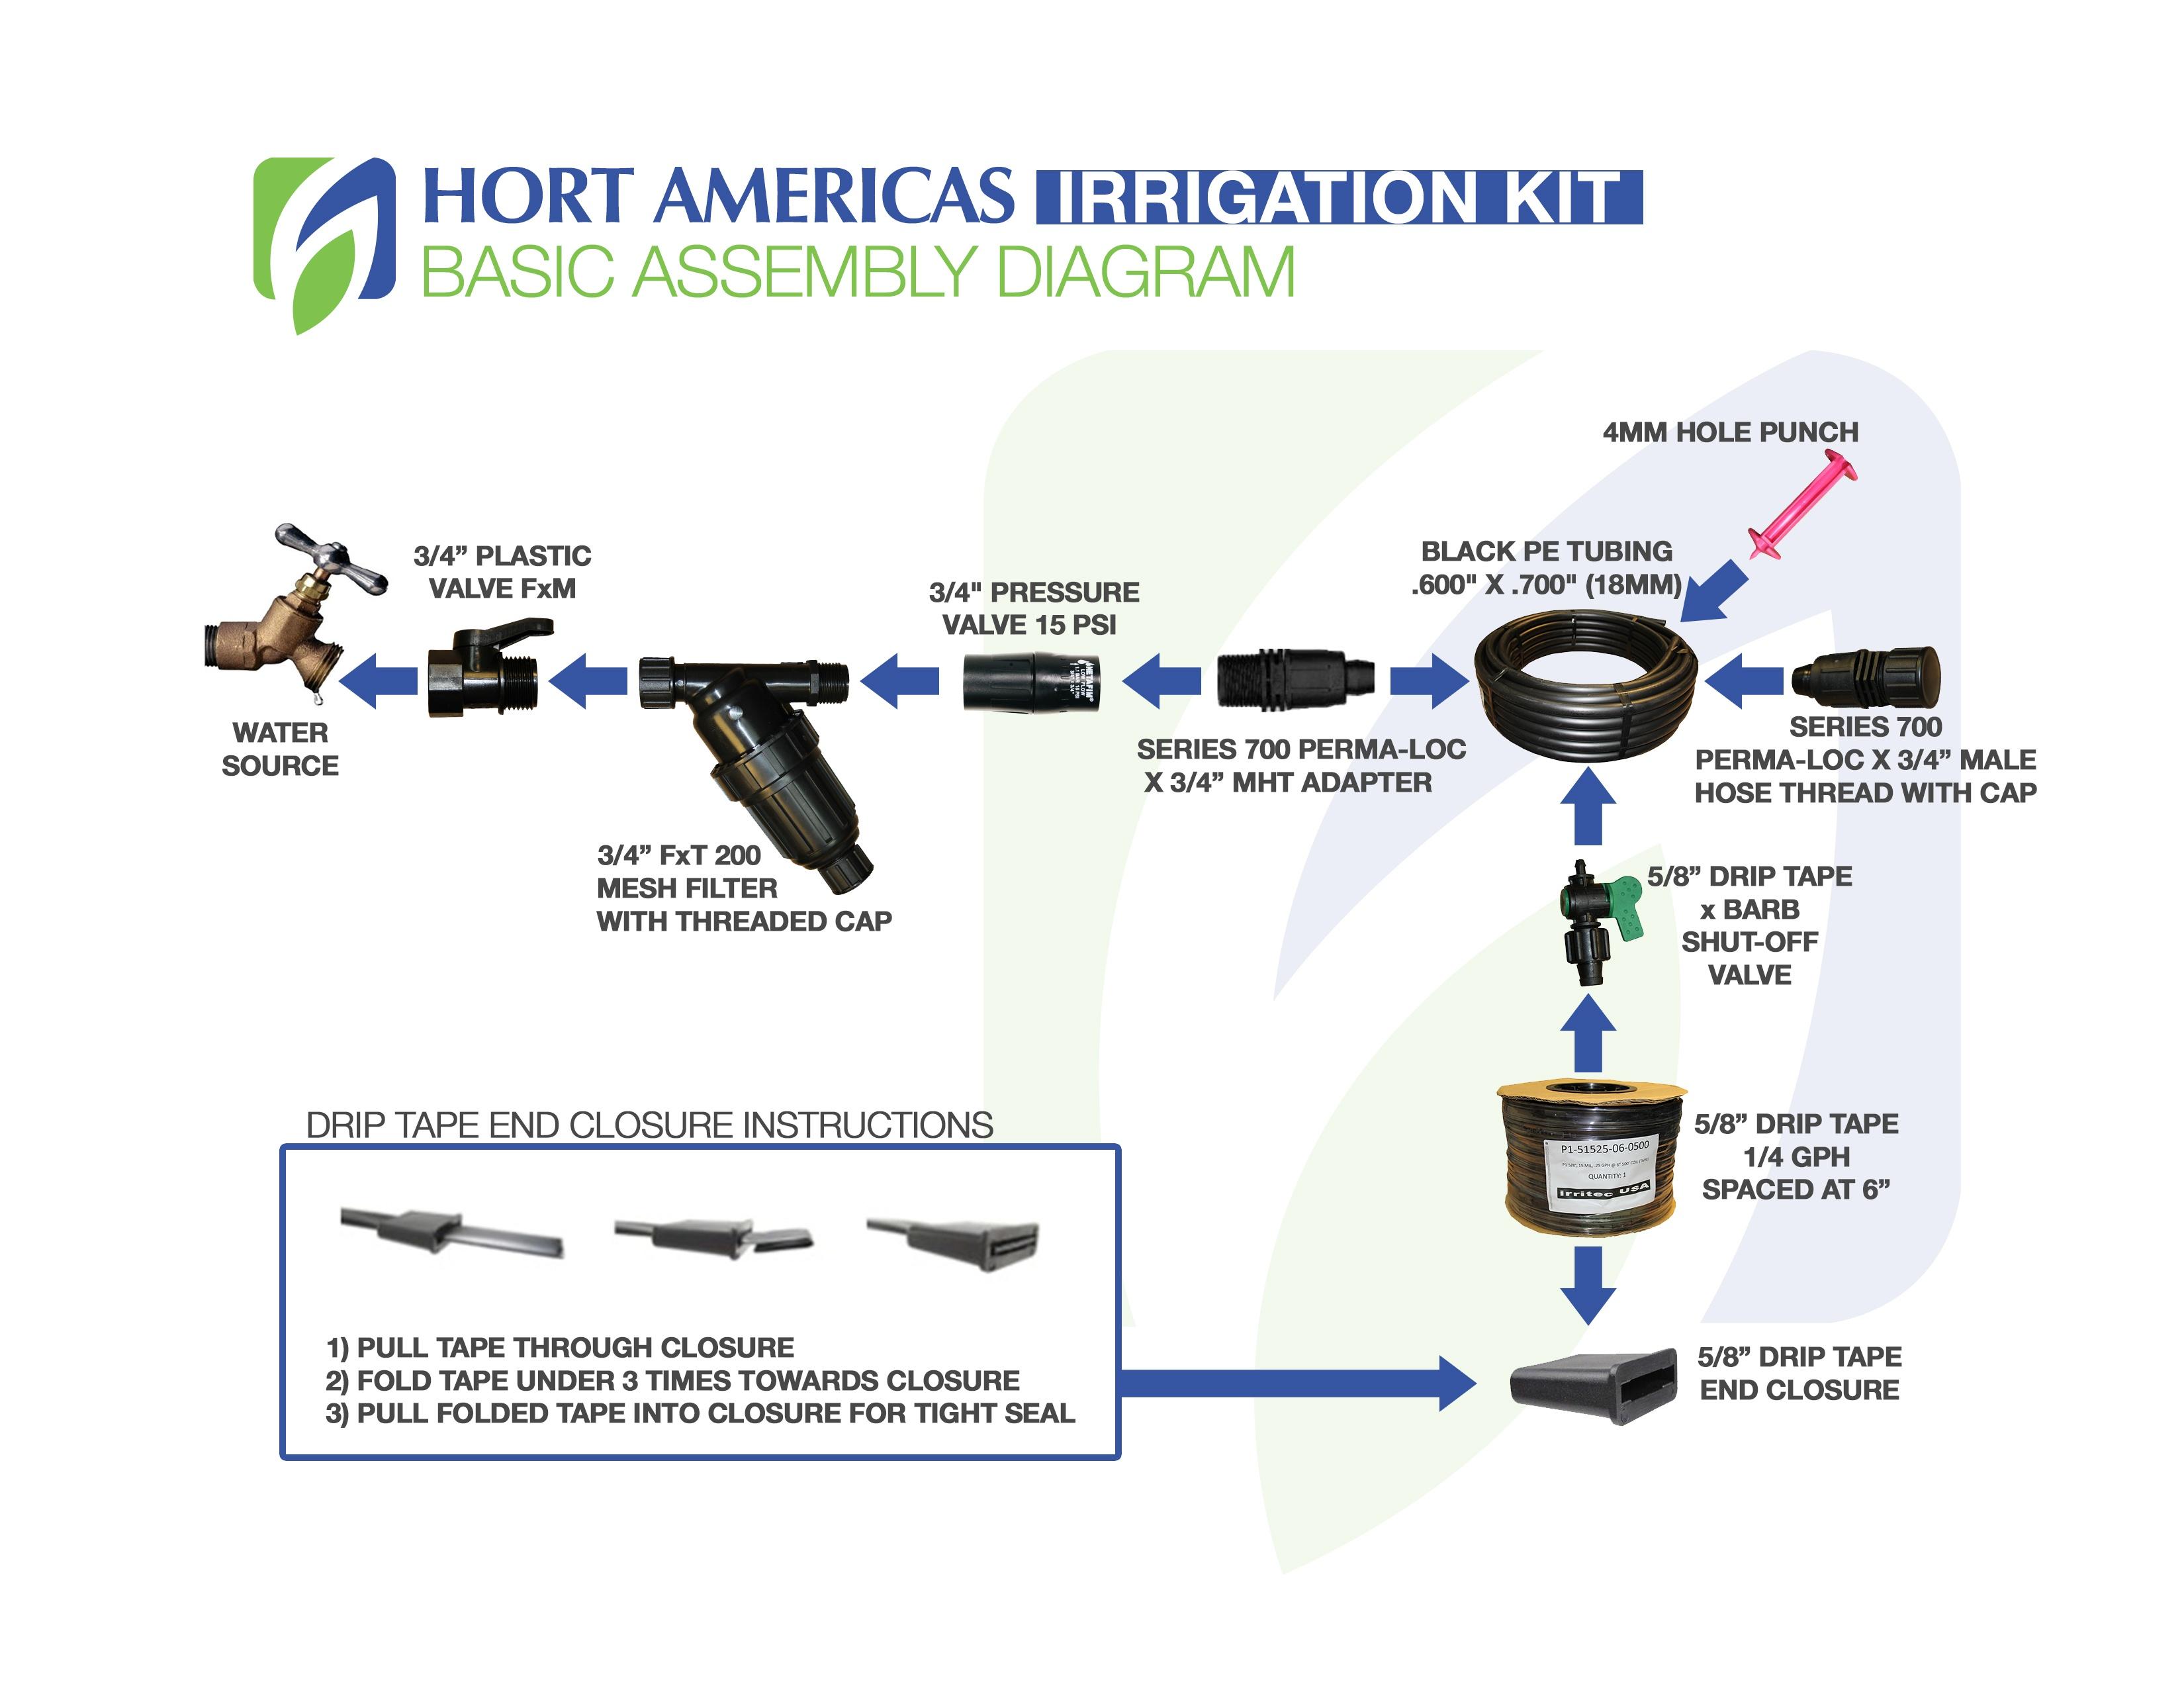 Hort Americas Irrigation Kit Layout